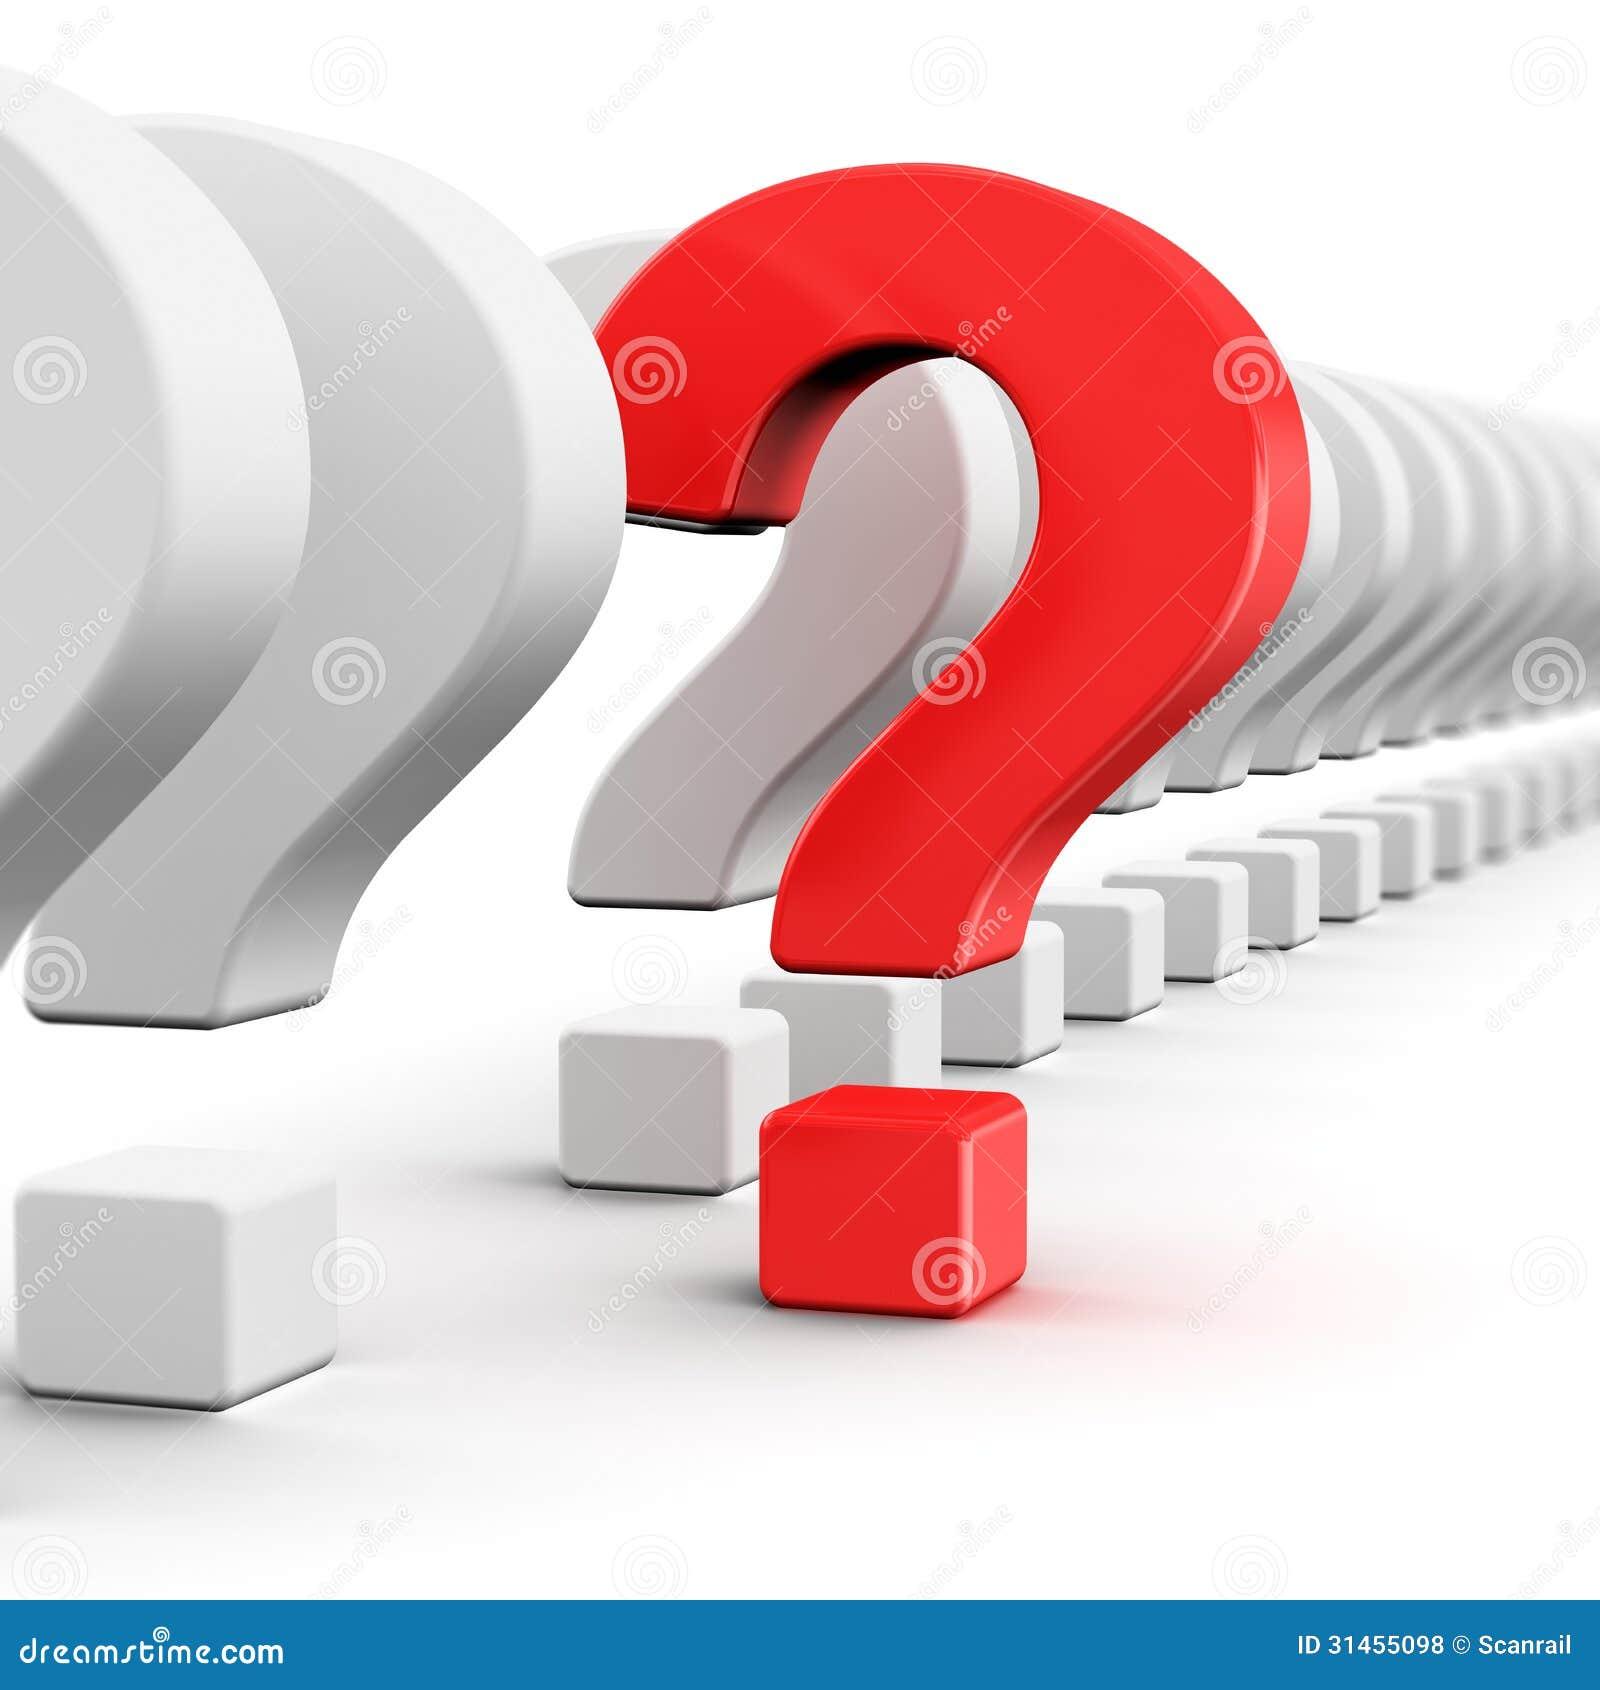 Main question 14